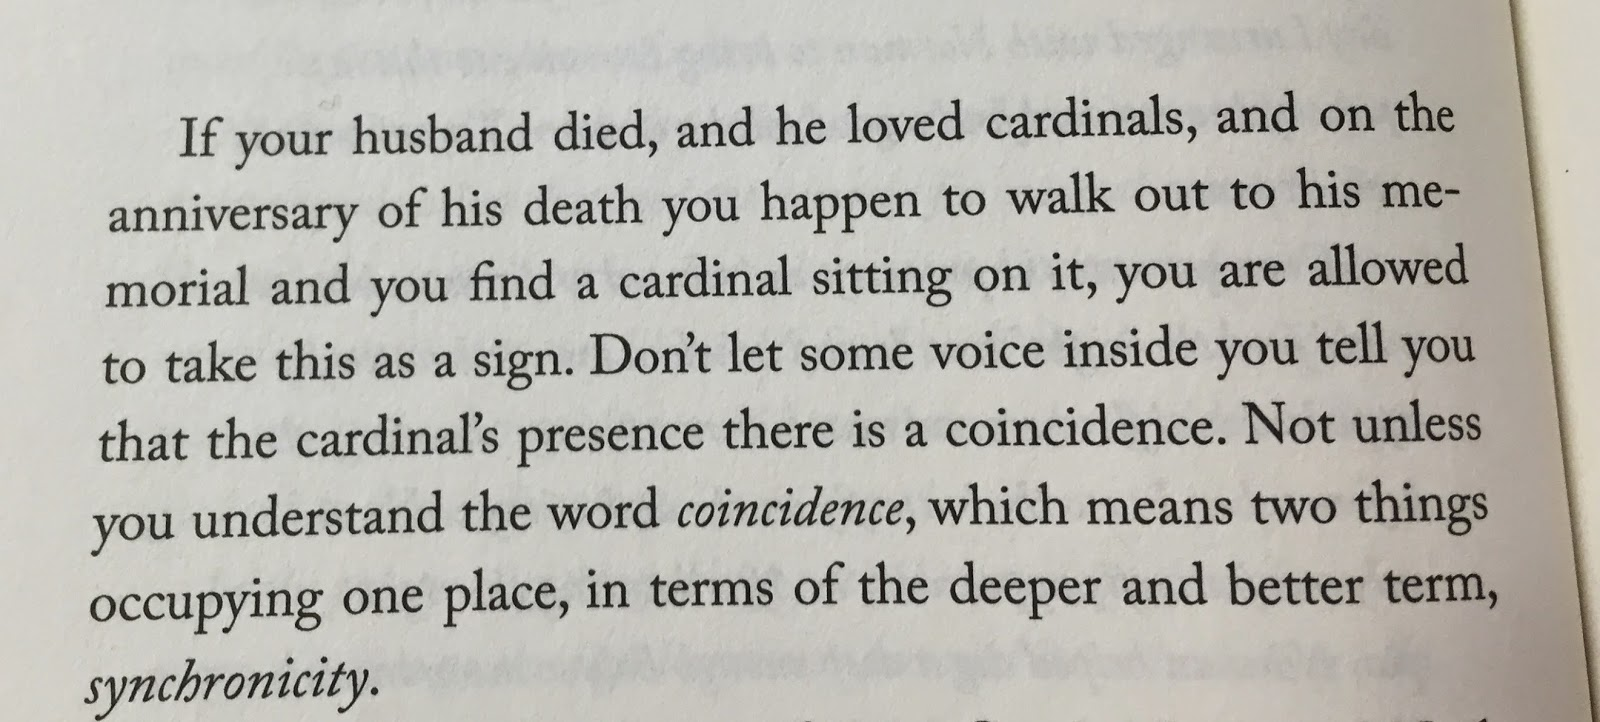 memories to cherish the map of heaven cardinals